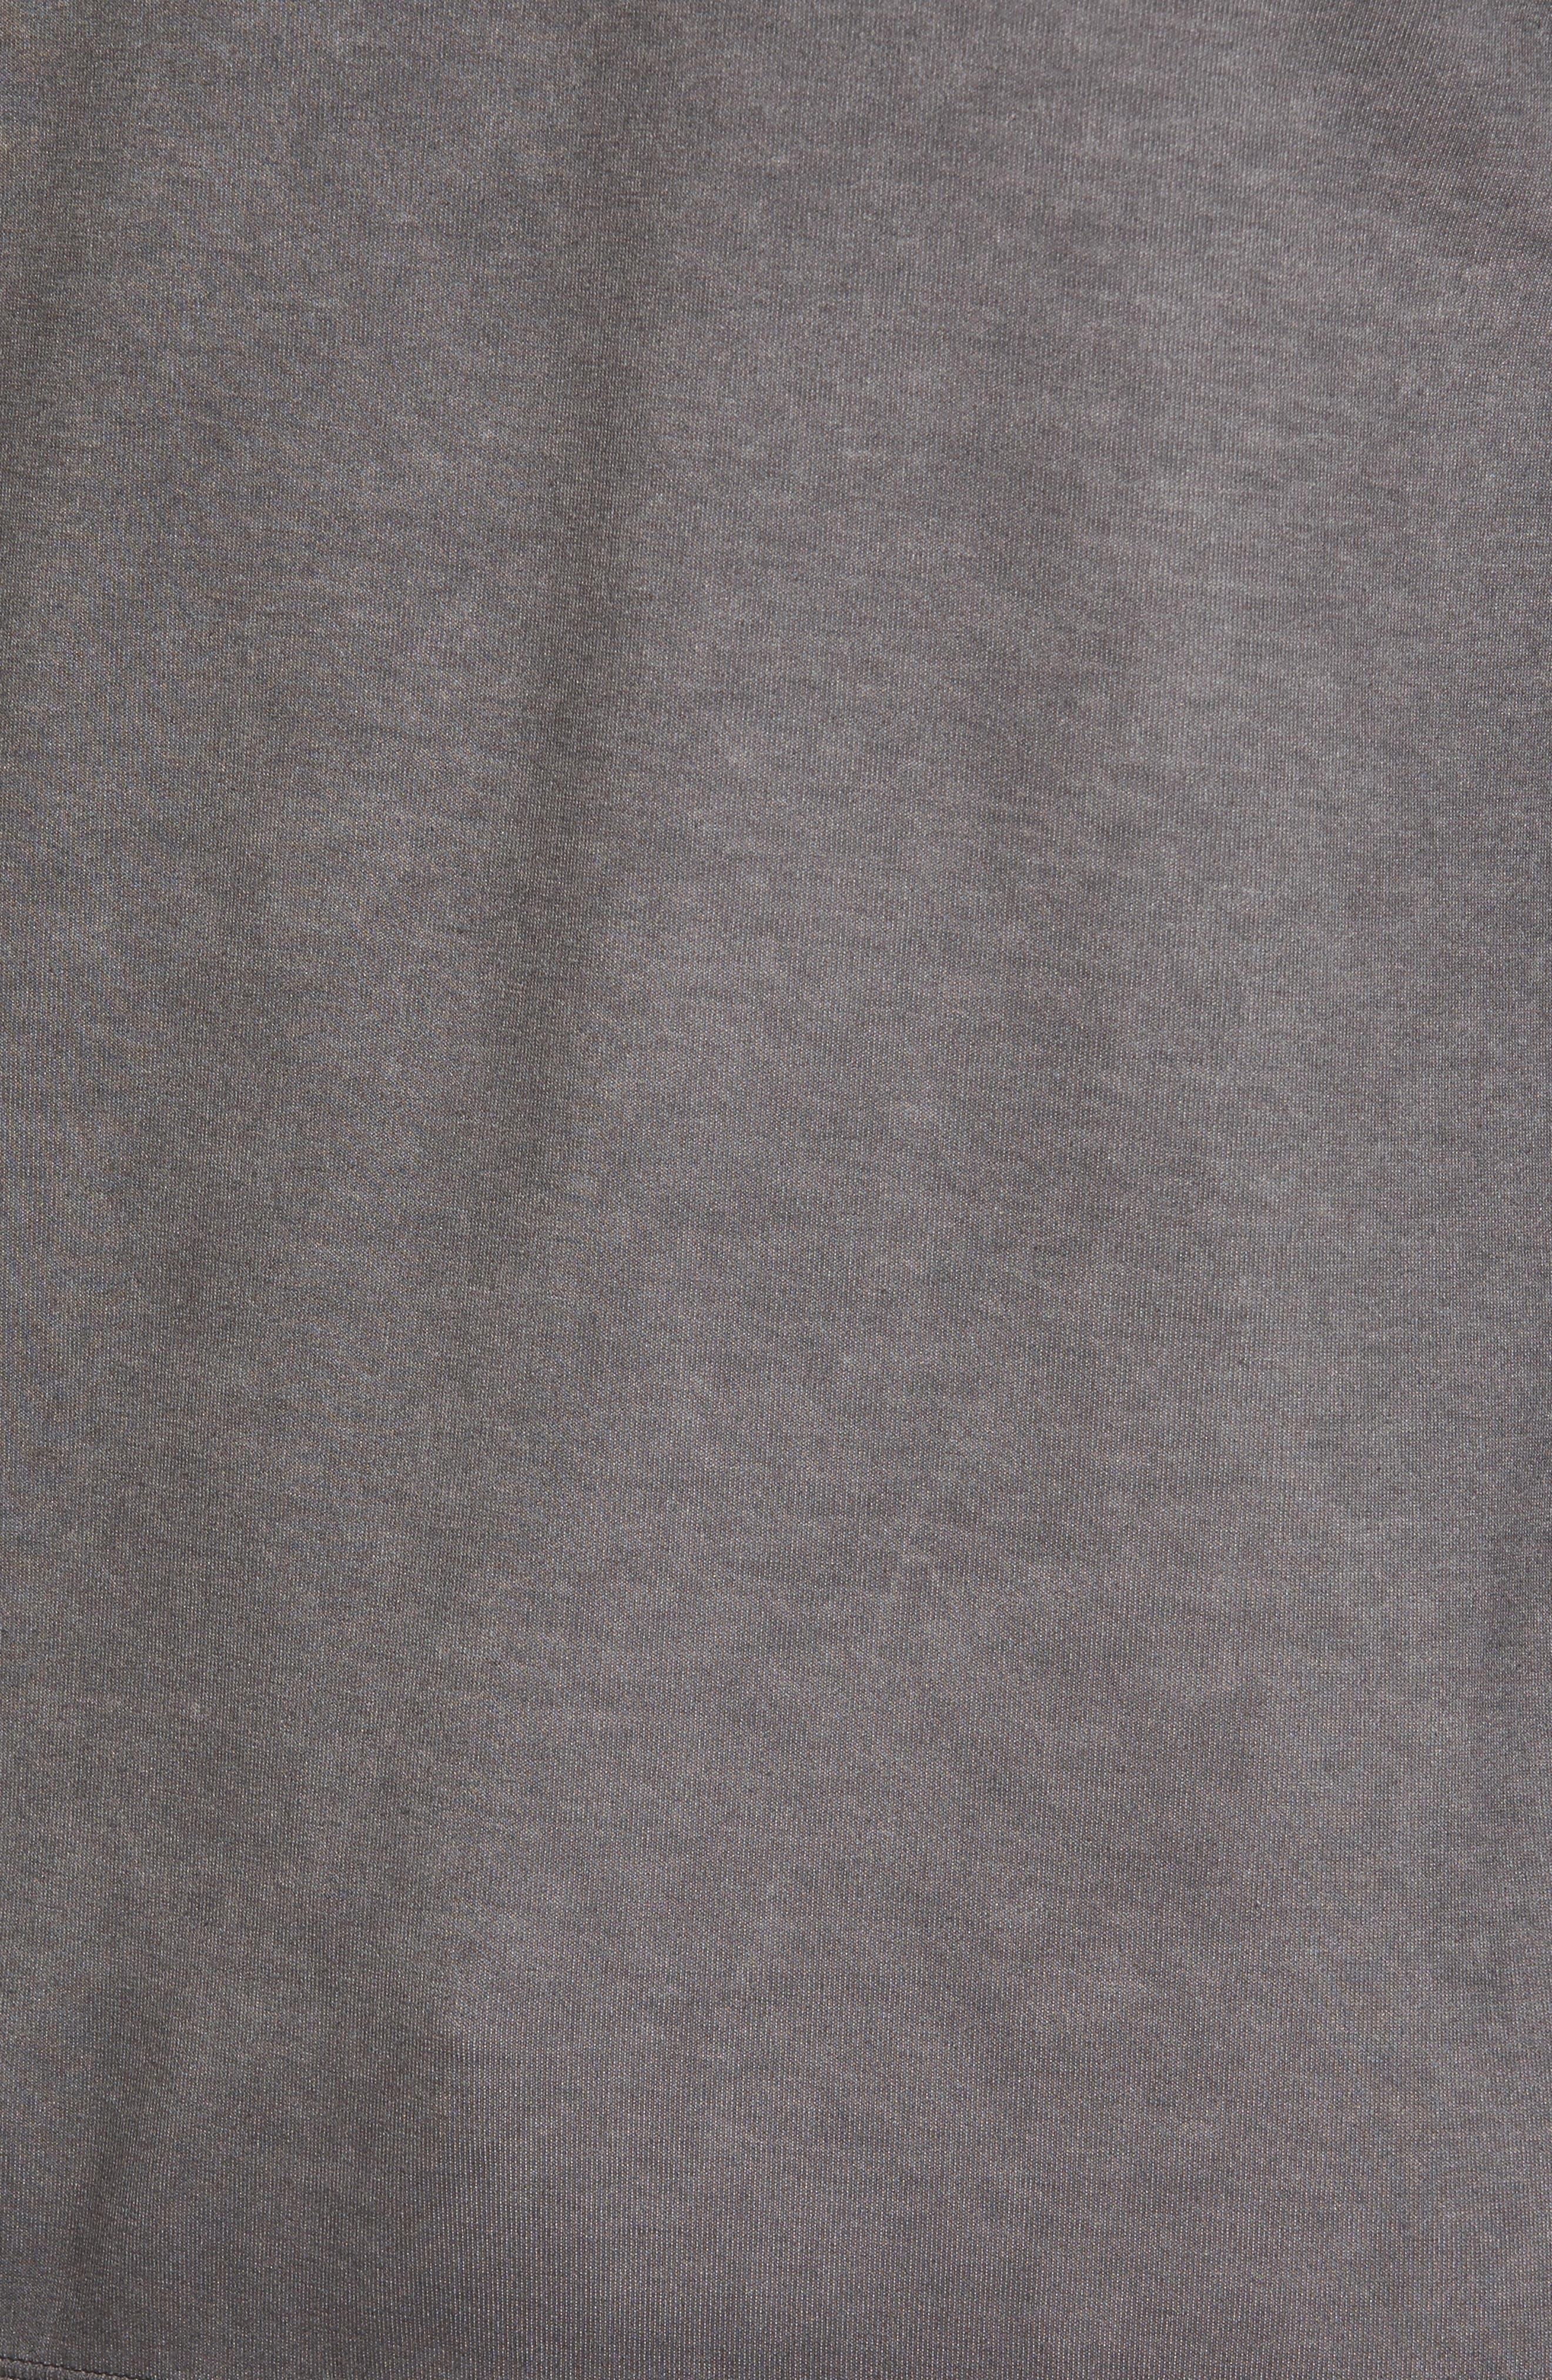 Dirty Wash Sweatshirt,                             Alternate thumbnail 5, color,                             040